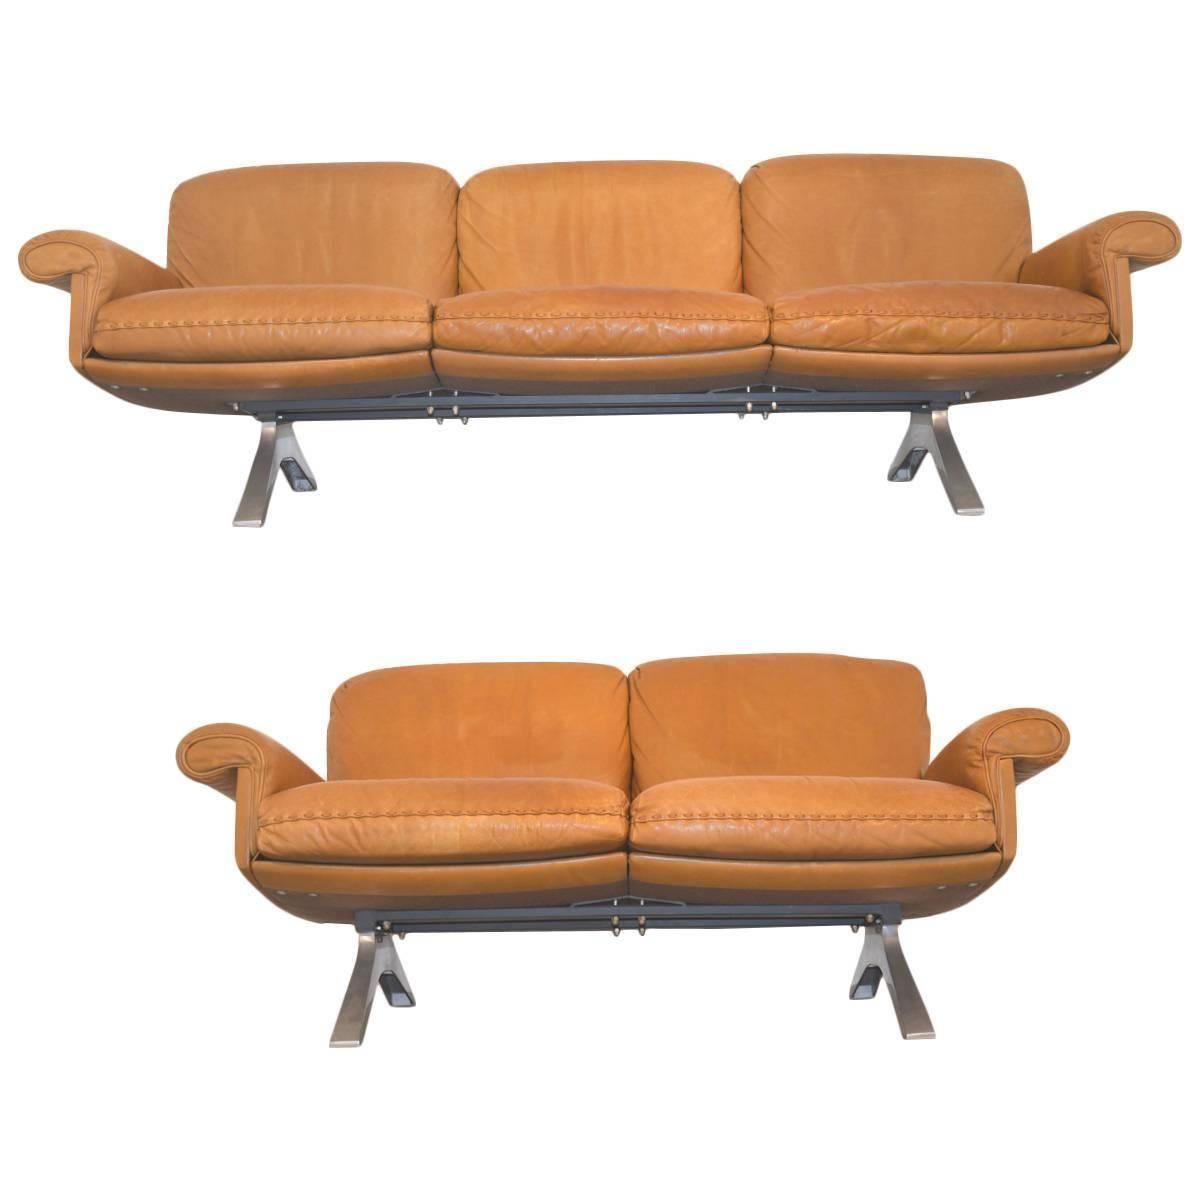 Vintage De Sede DS 31 Three-Seat Sofa 1970s For Sale At